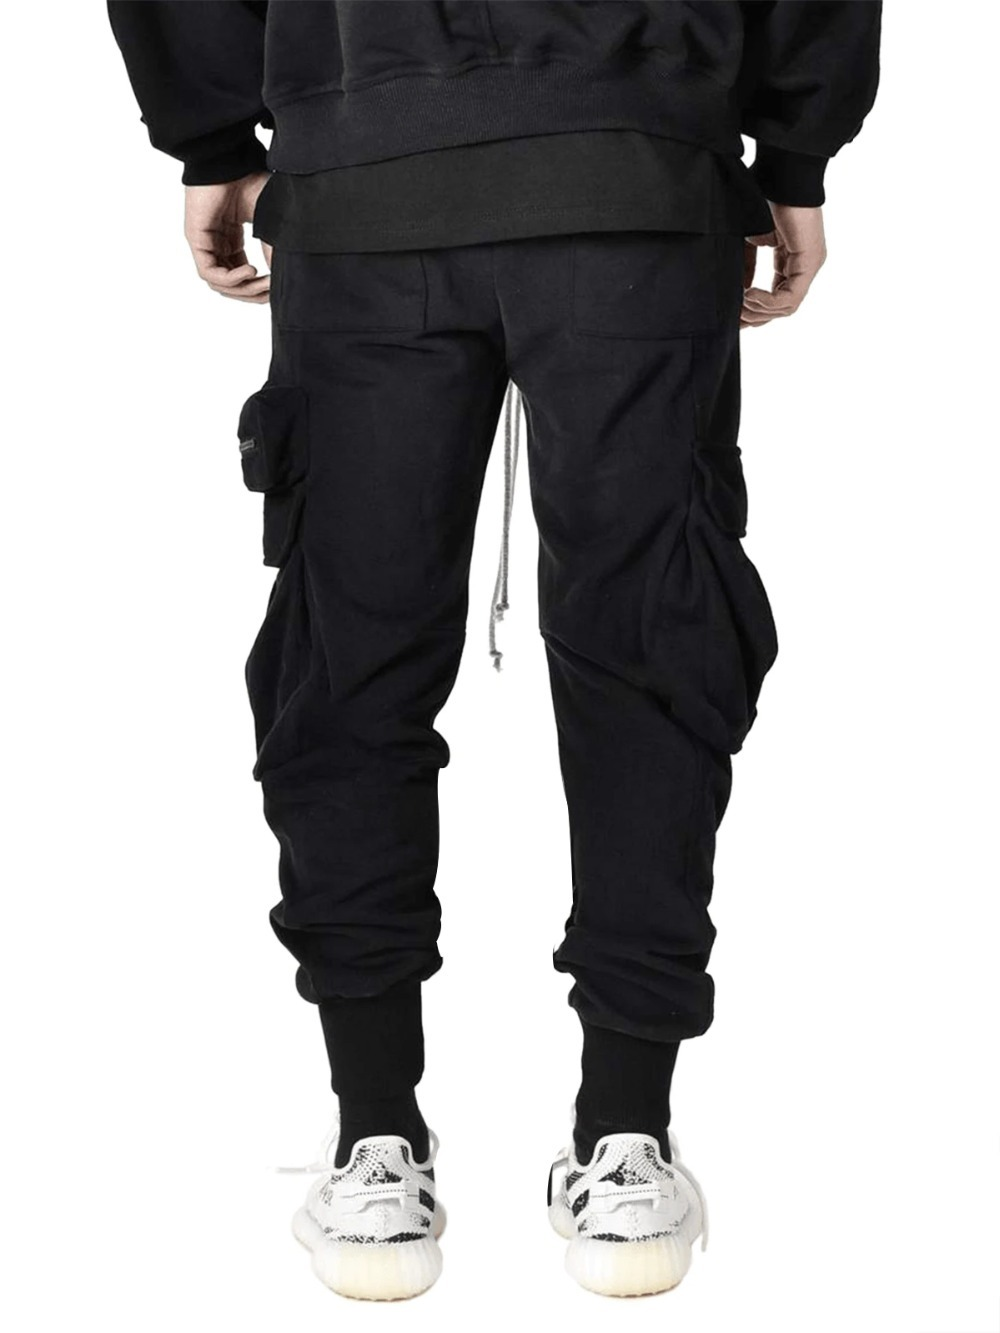 cargosweatpants-black_back_1200x1600